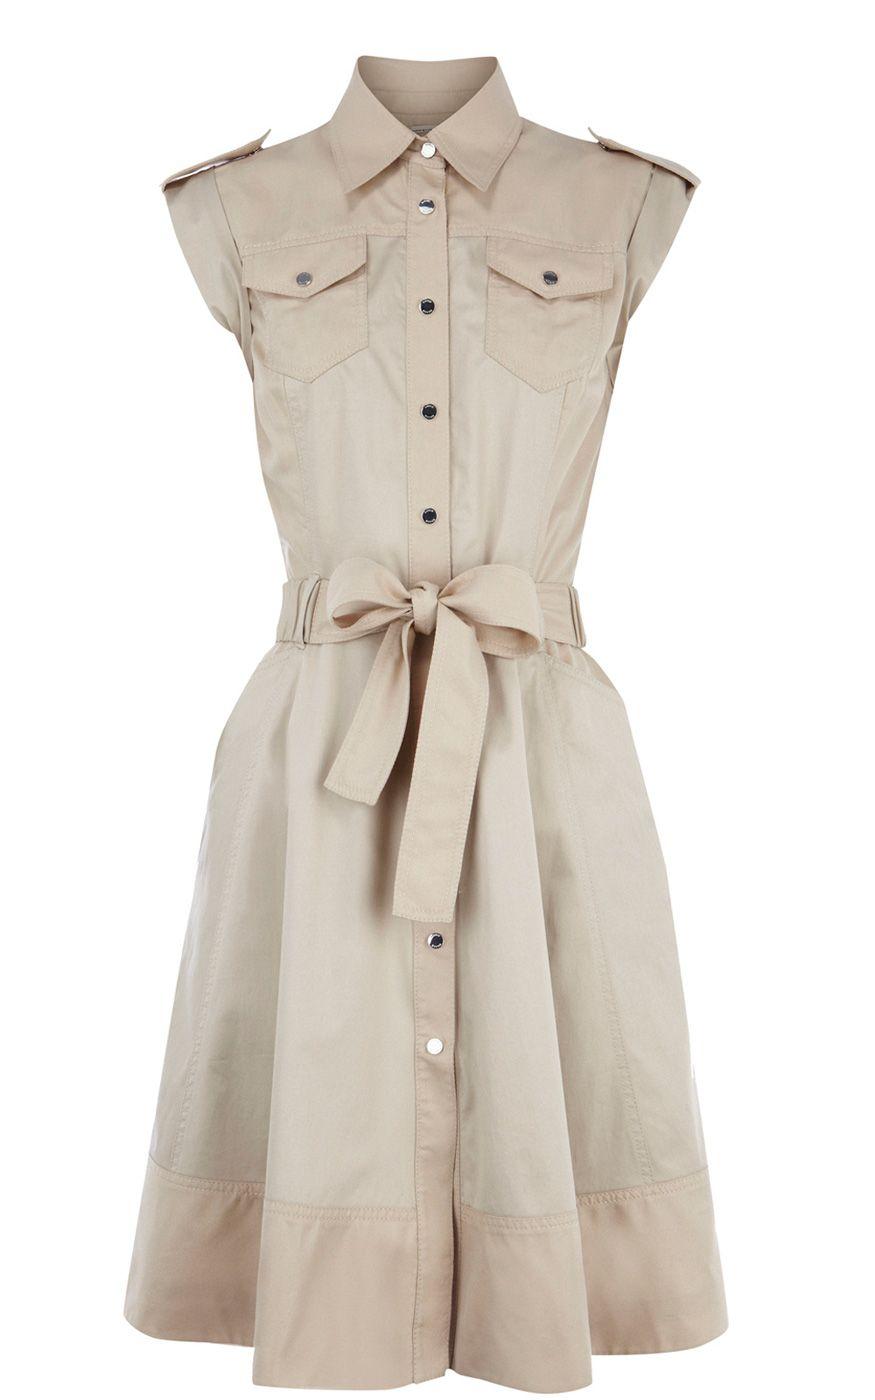 Popular Karen Millen Soft Safari Dress Neutral ,fashion Karen Millen Solid  GM14